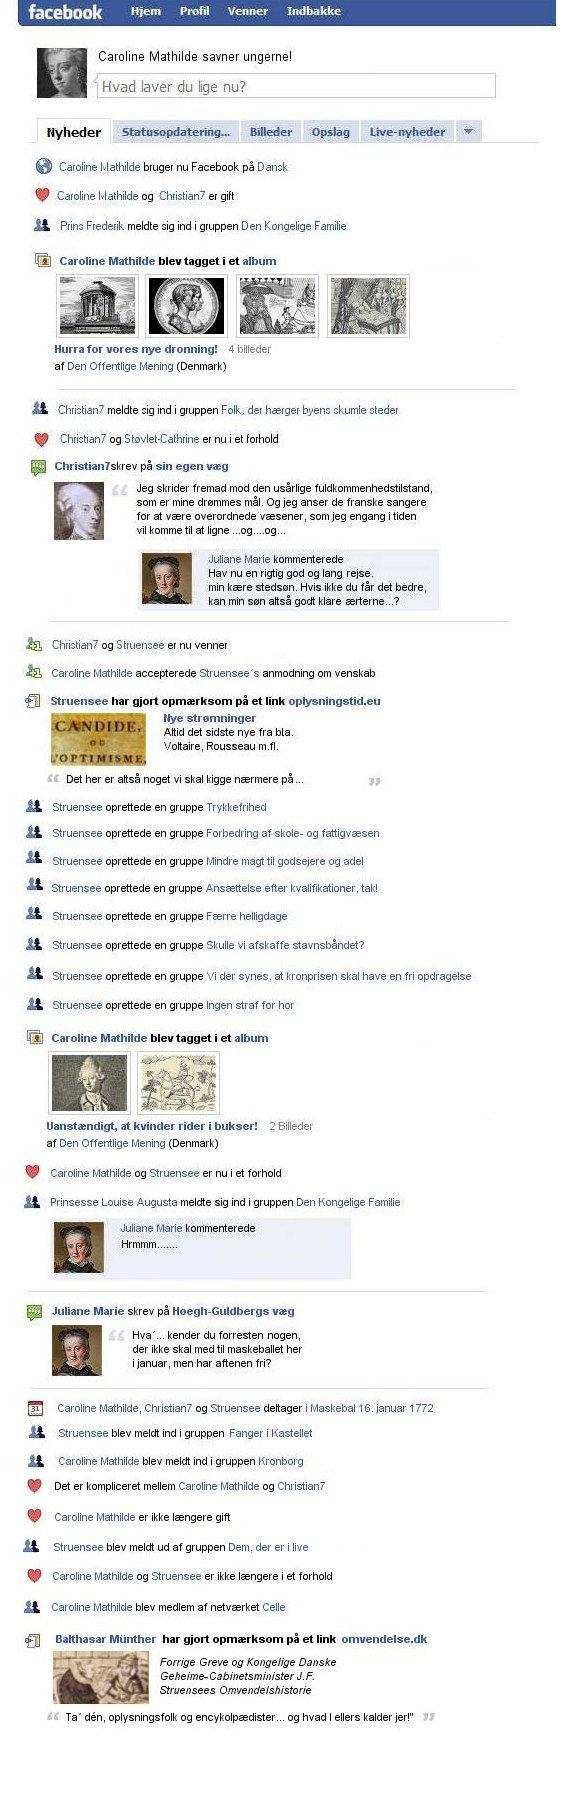 carolinemathilde_facebookformat